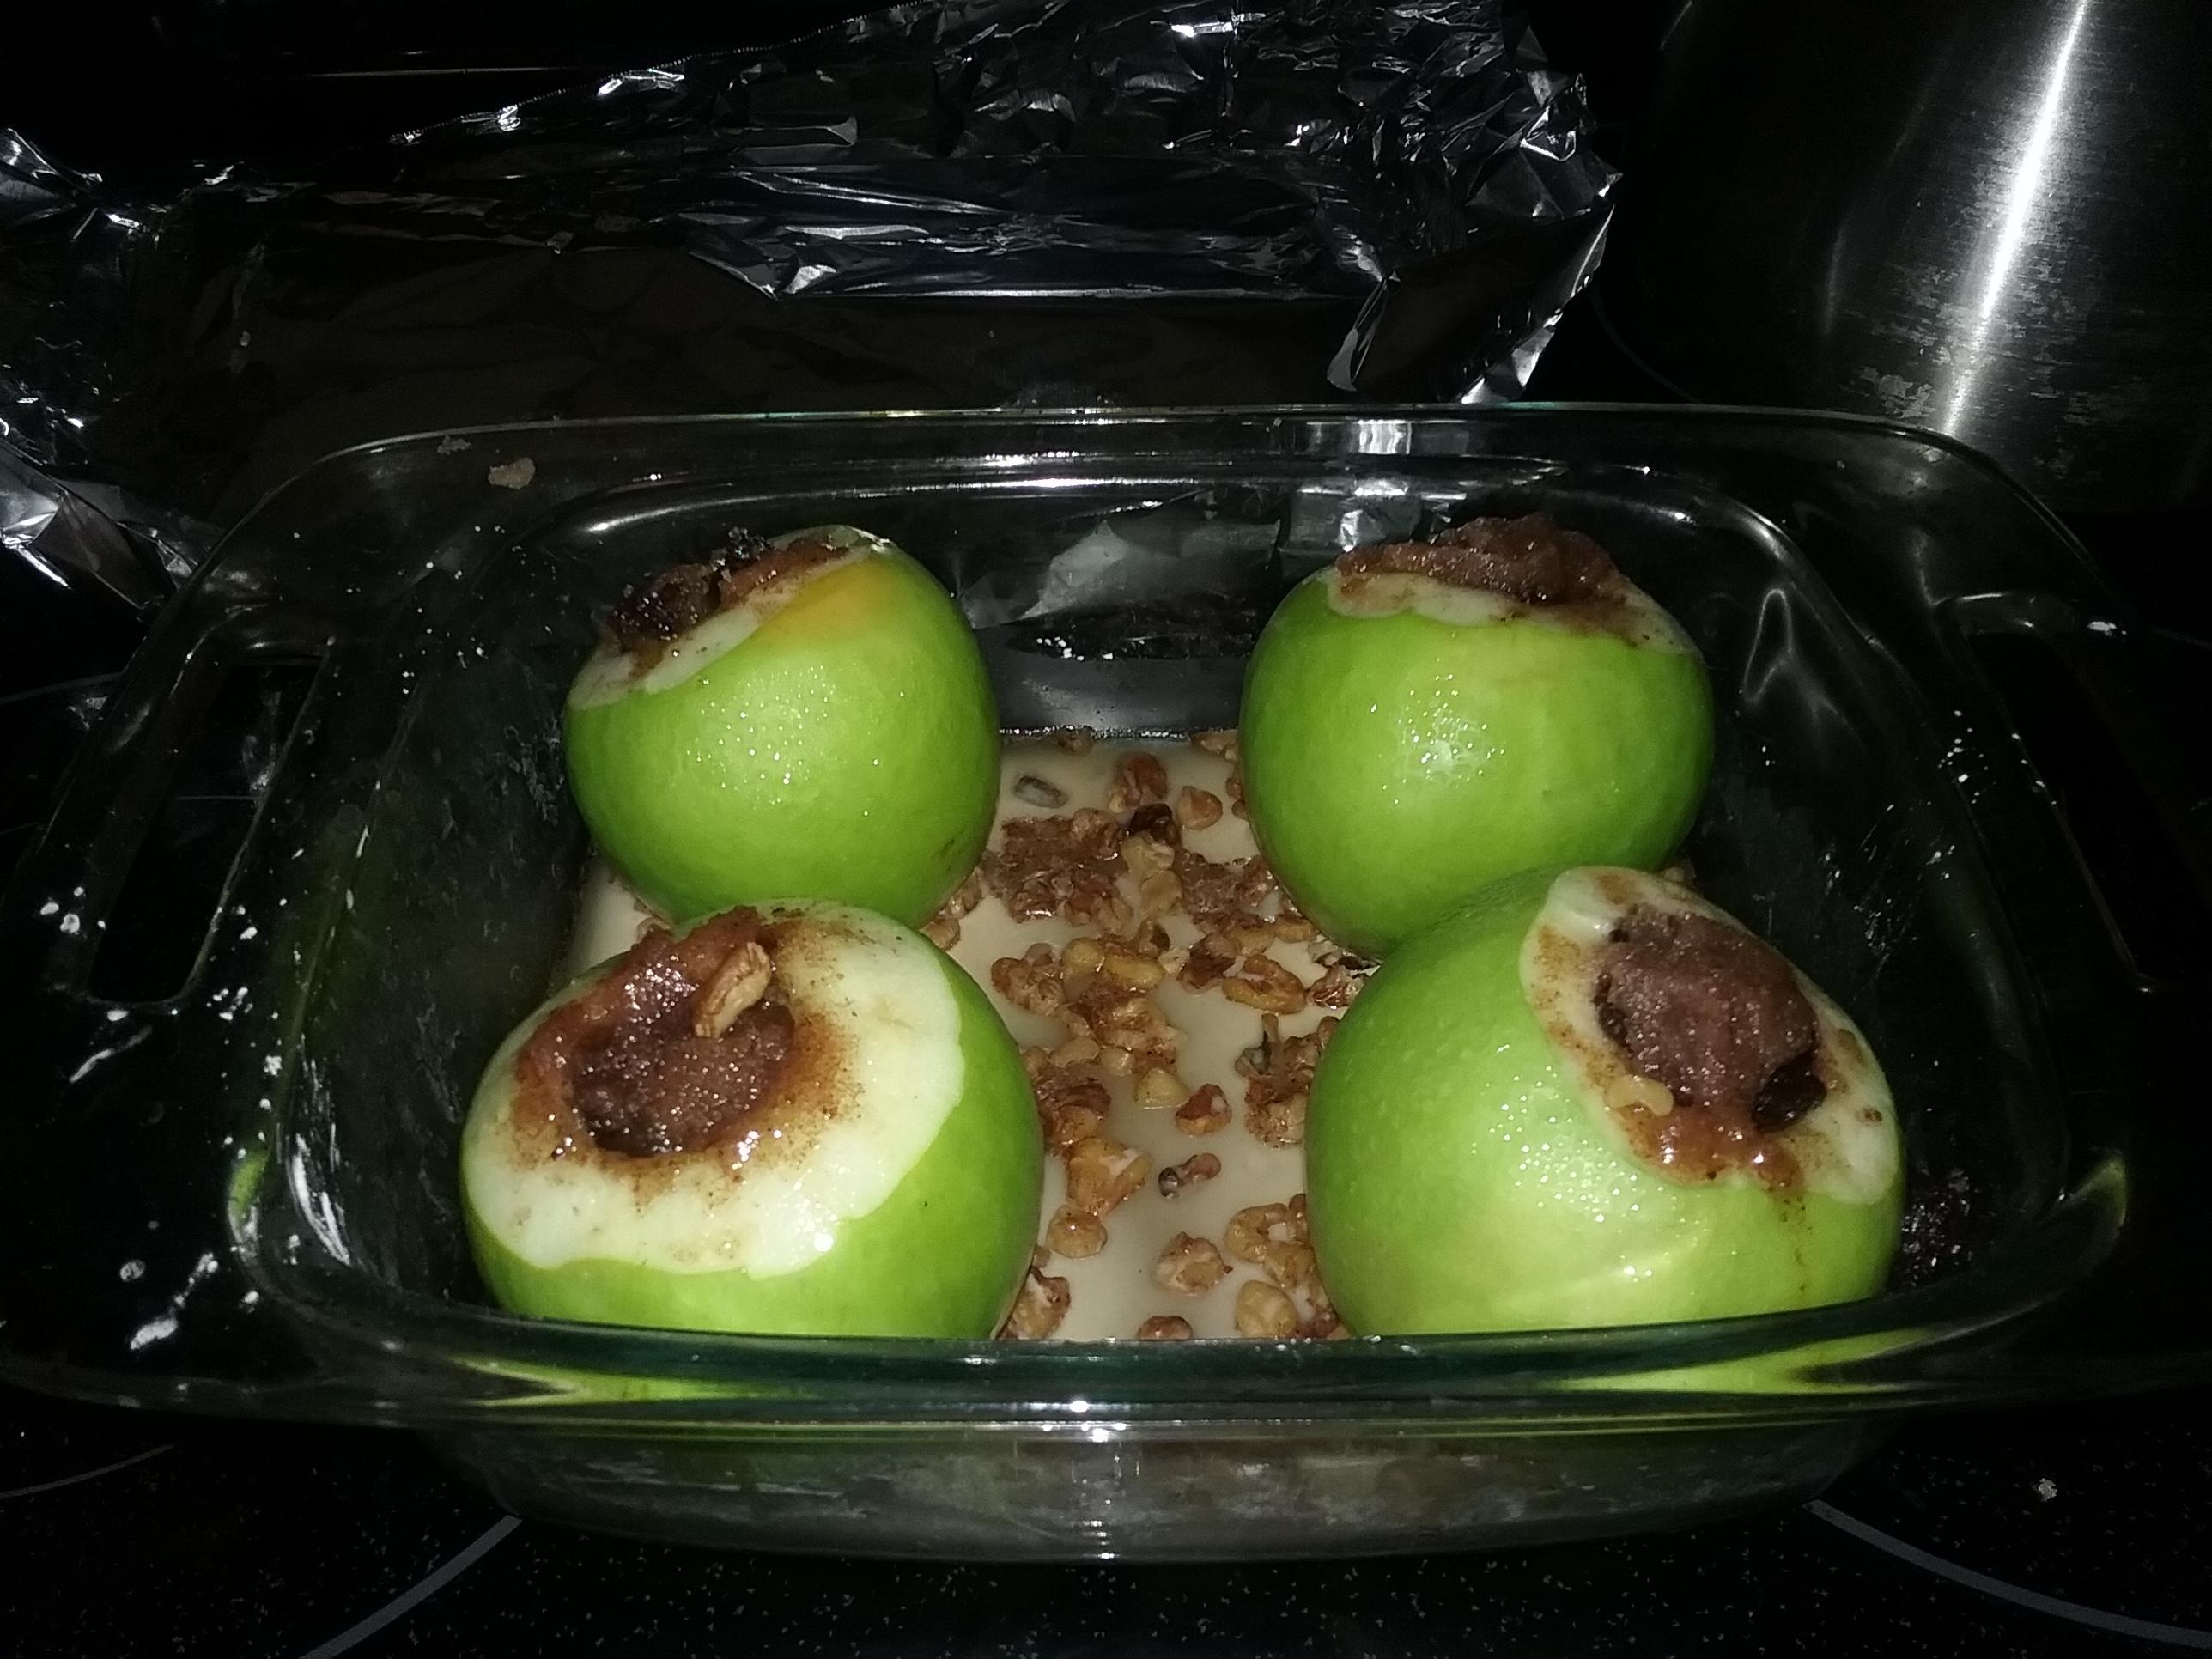 Spiced Pirate Baked Apples mebyrne